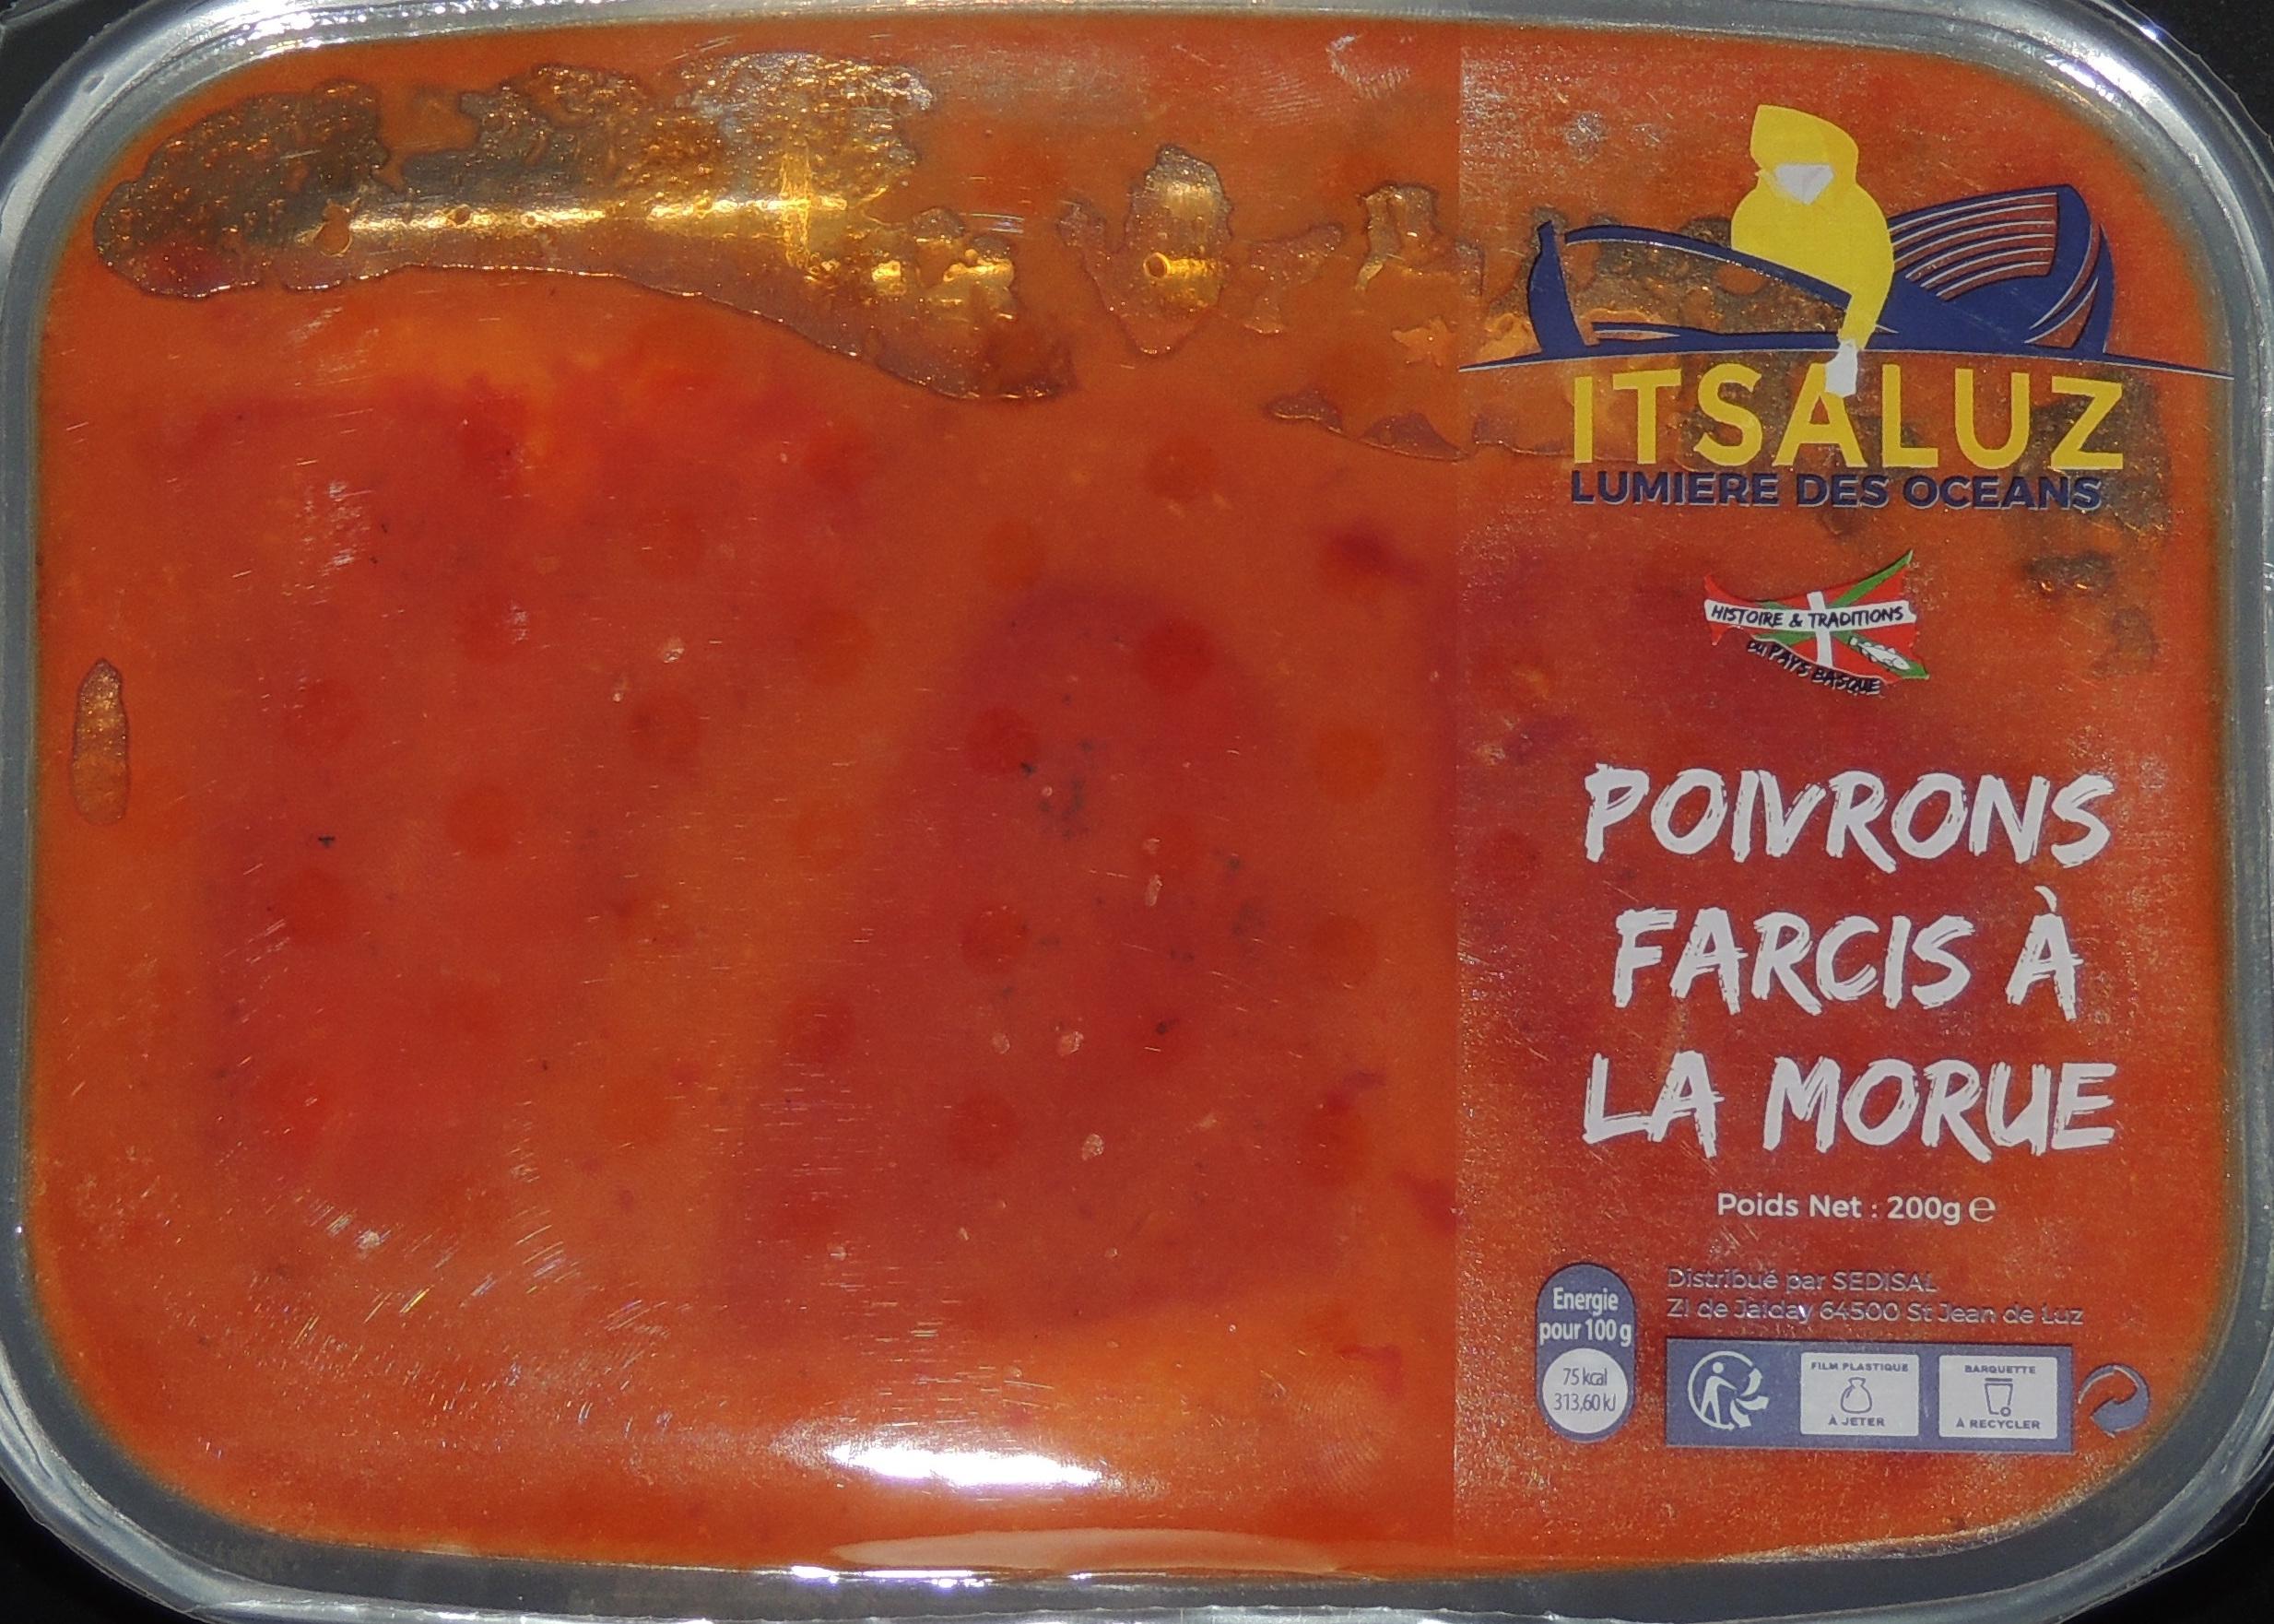 Poivrons farcis à la morue, Itsaluz (200 g)